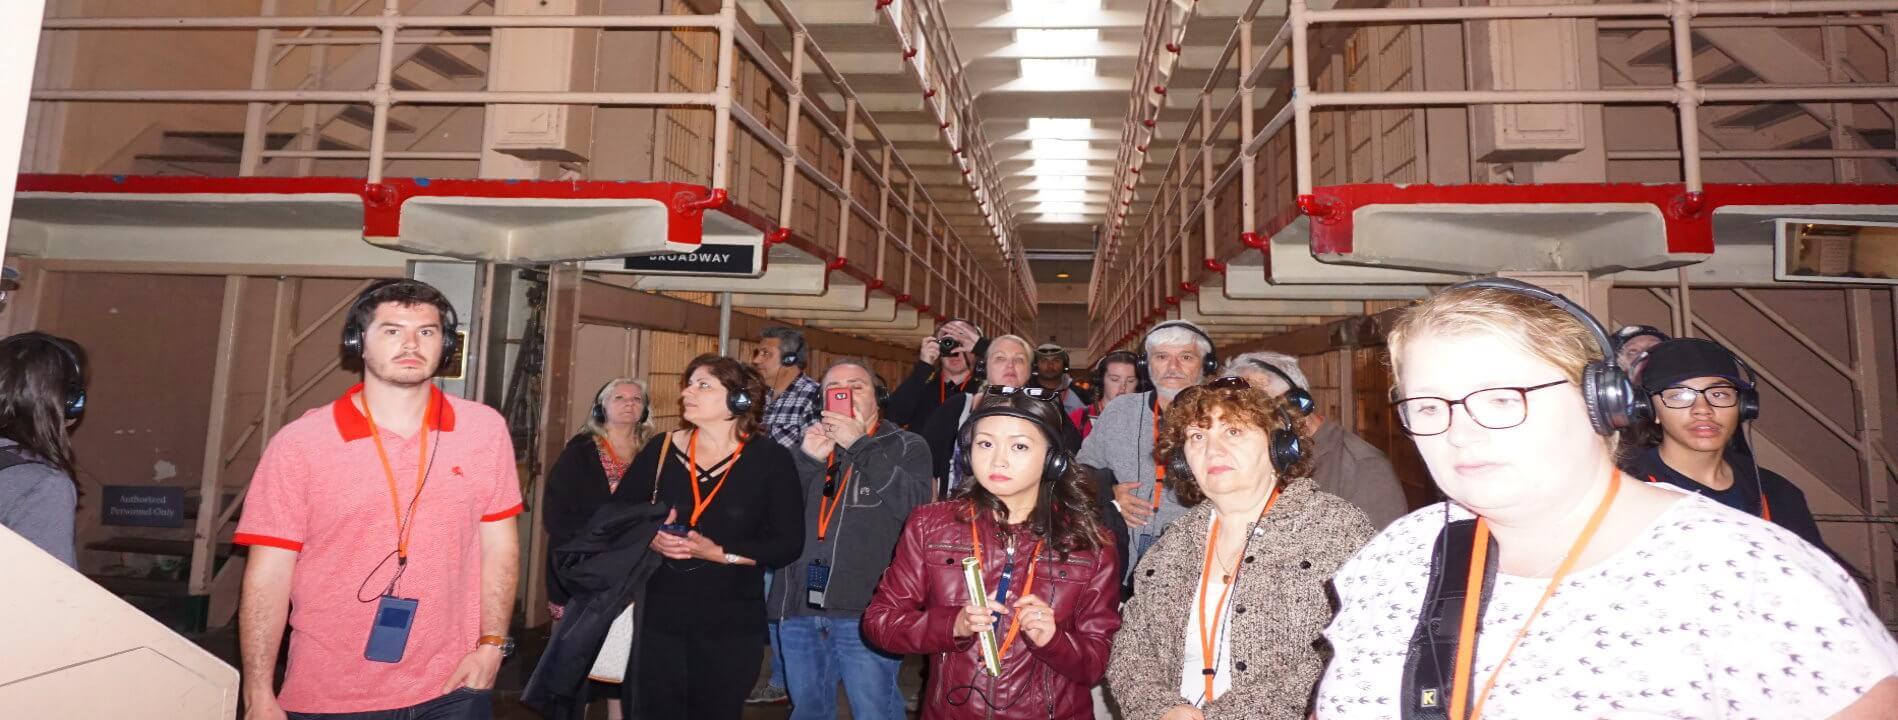 Alcatraz-Island-Prison-Cell-Walking-Audio-Guided-Tour-cells-cell-blocs-SanFrancisco